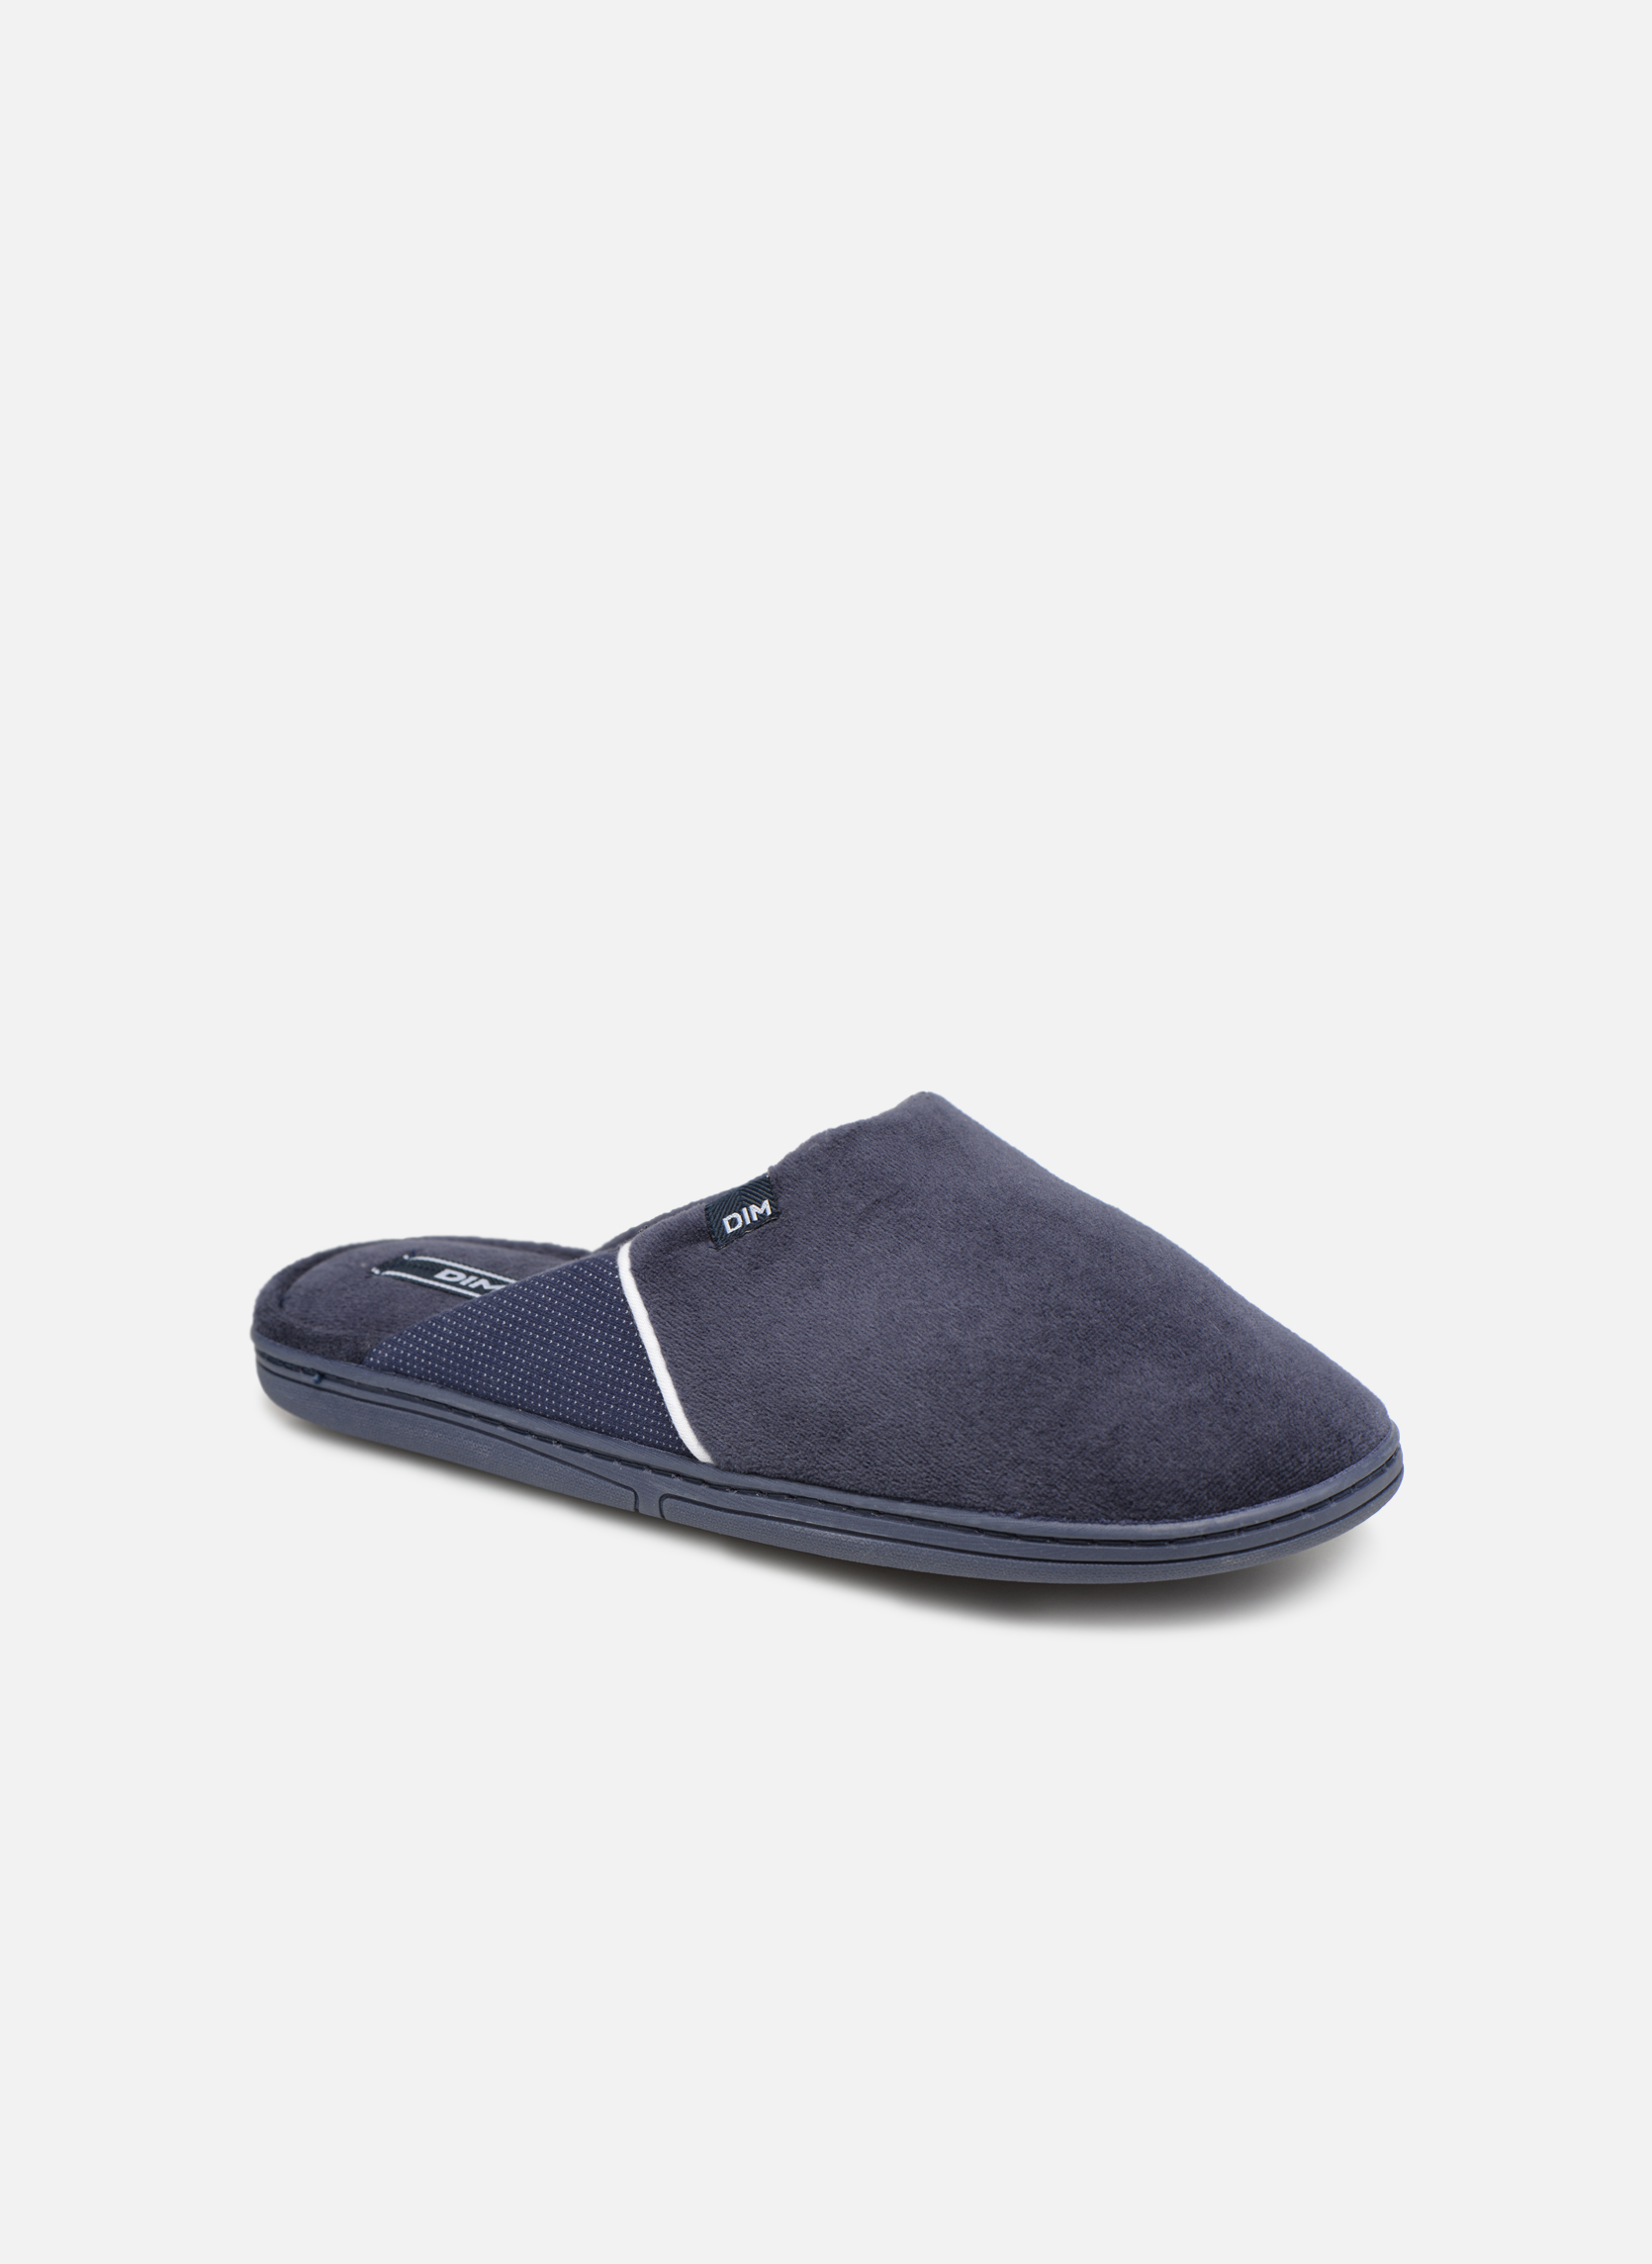 Pantoffels Dim Blauw